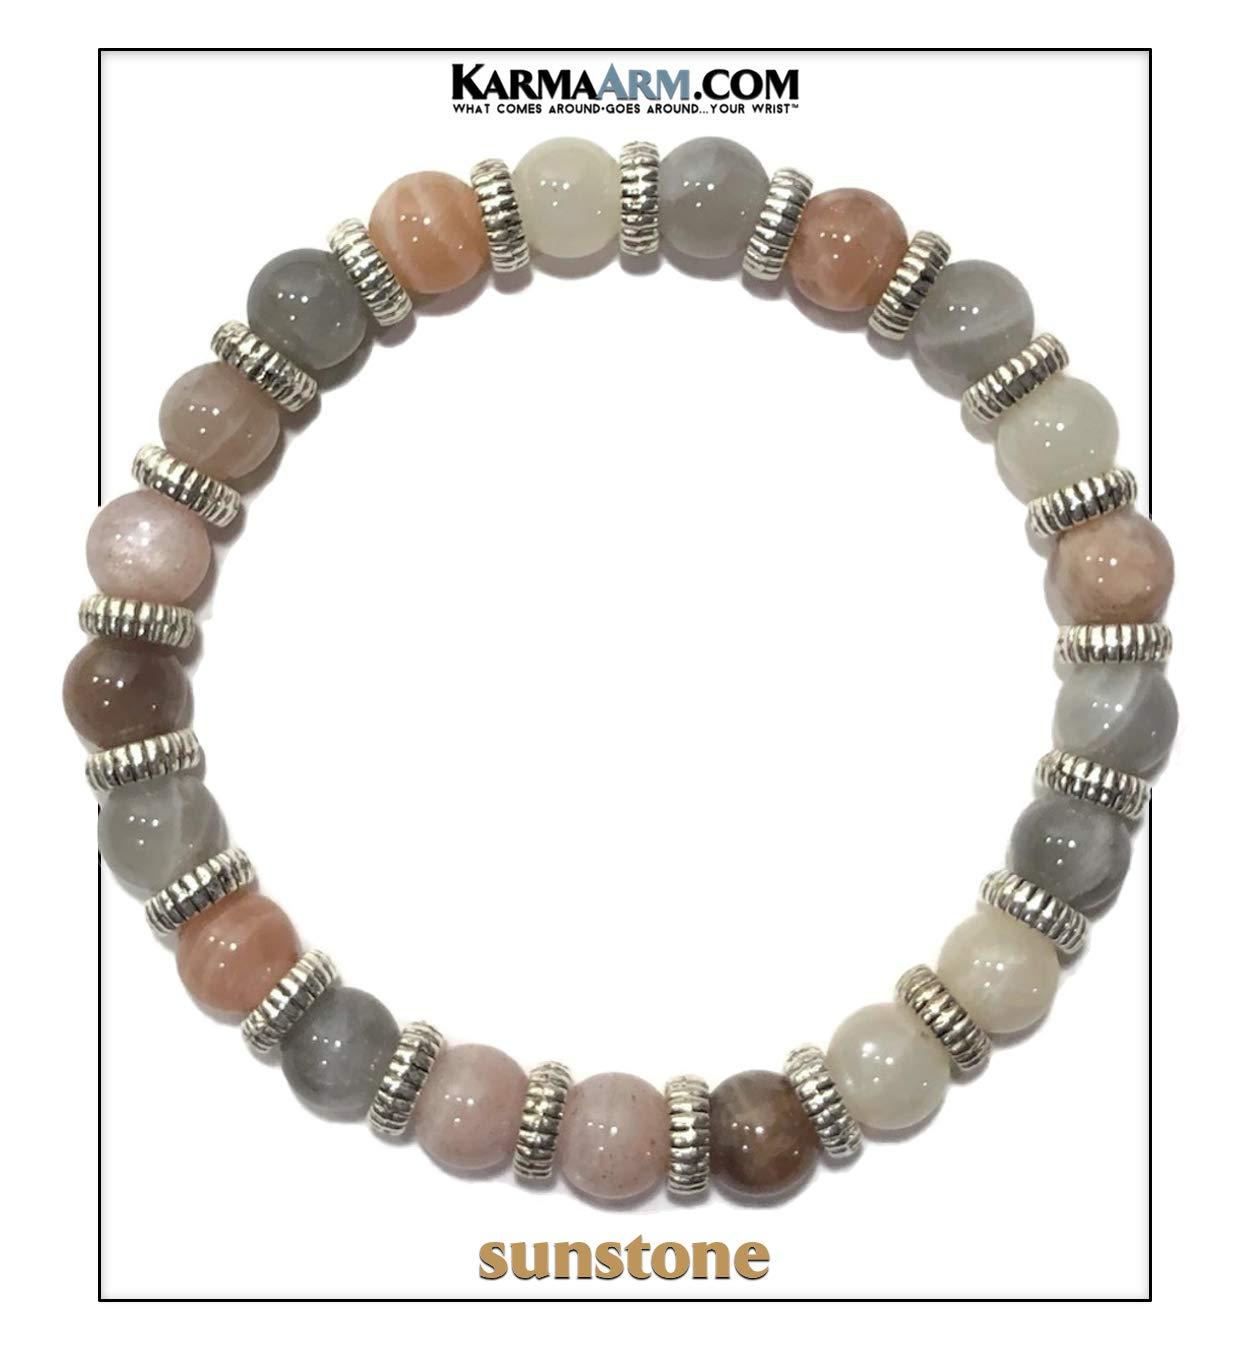 KarmaArm Meditation Bracelet | Self-Care Wellness Zen Mantra Bead Wristband Yoga Jewelry | Vista | Sunstone (7.5)